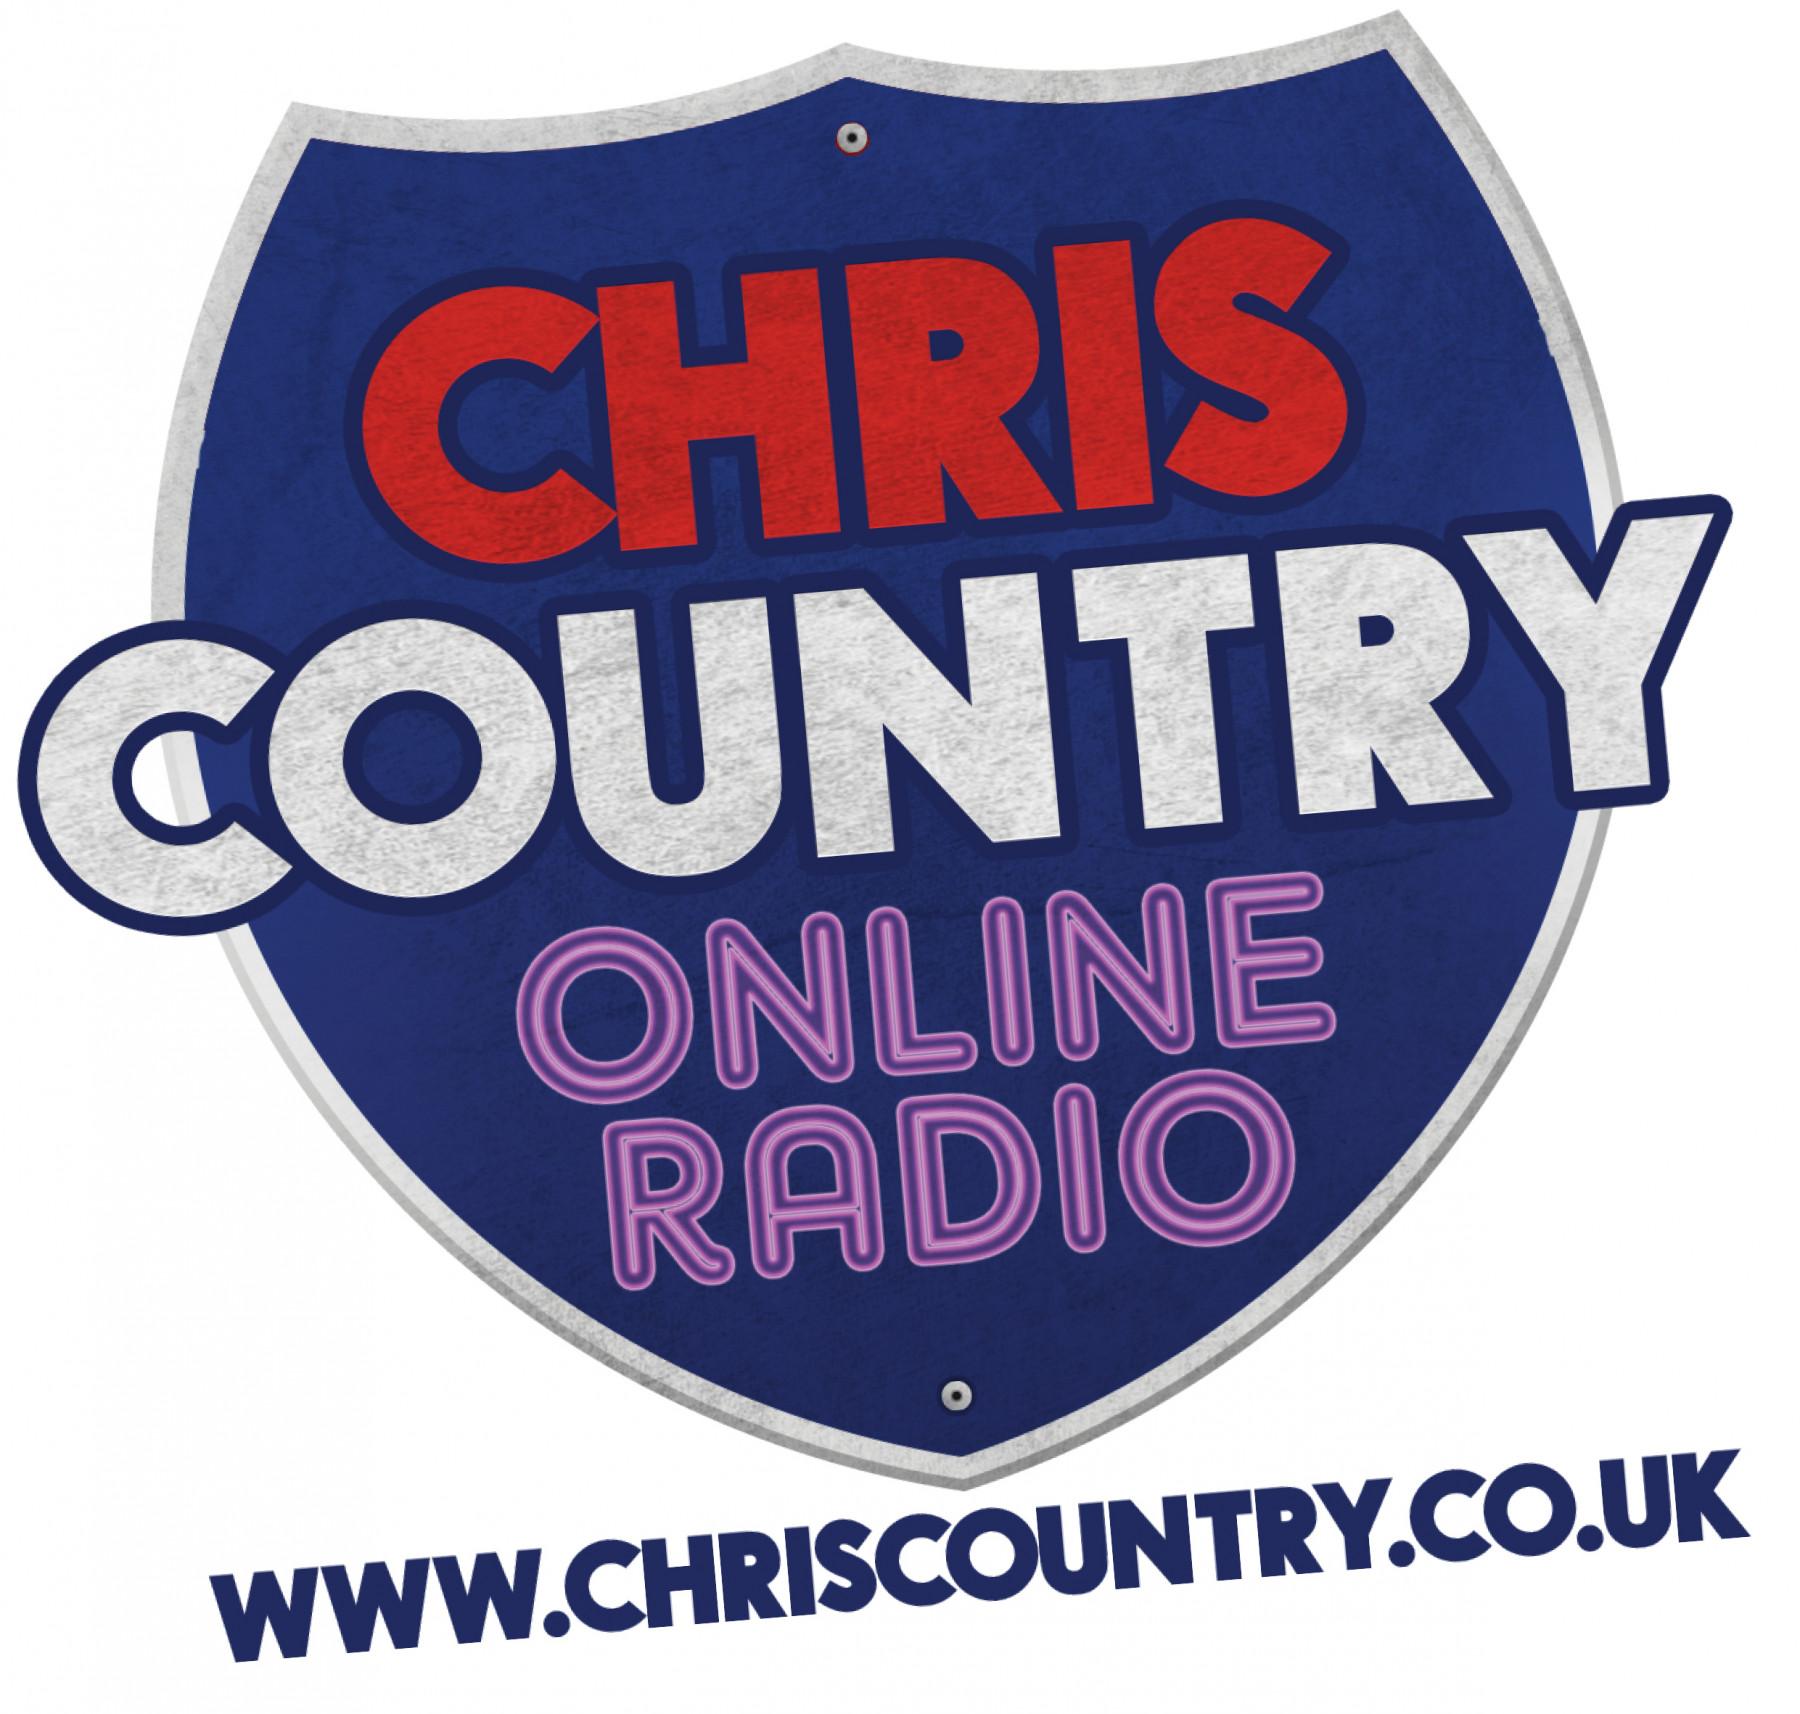 Chris Country radio signs Bob Kingsley s American Top 40 Show